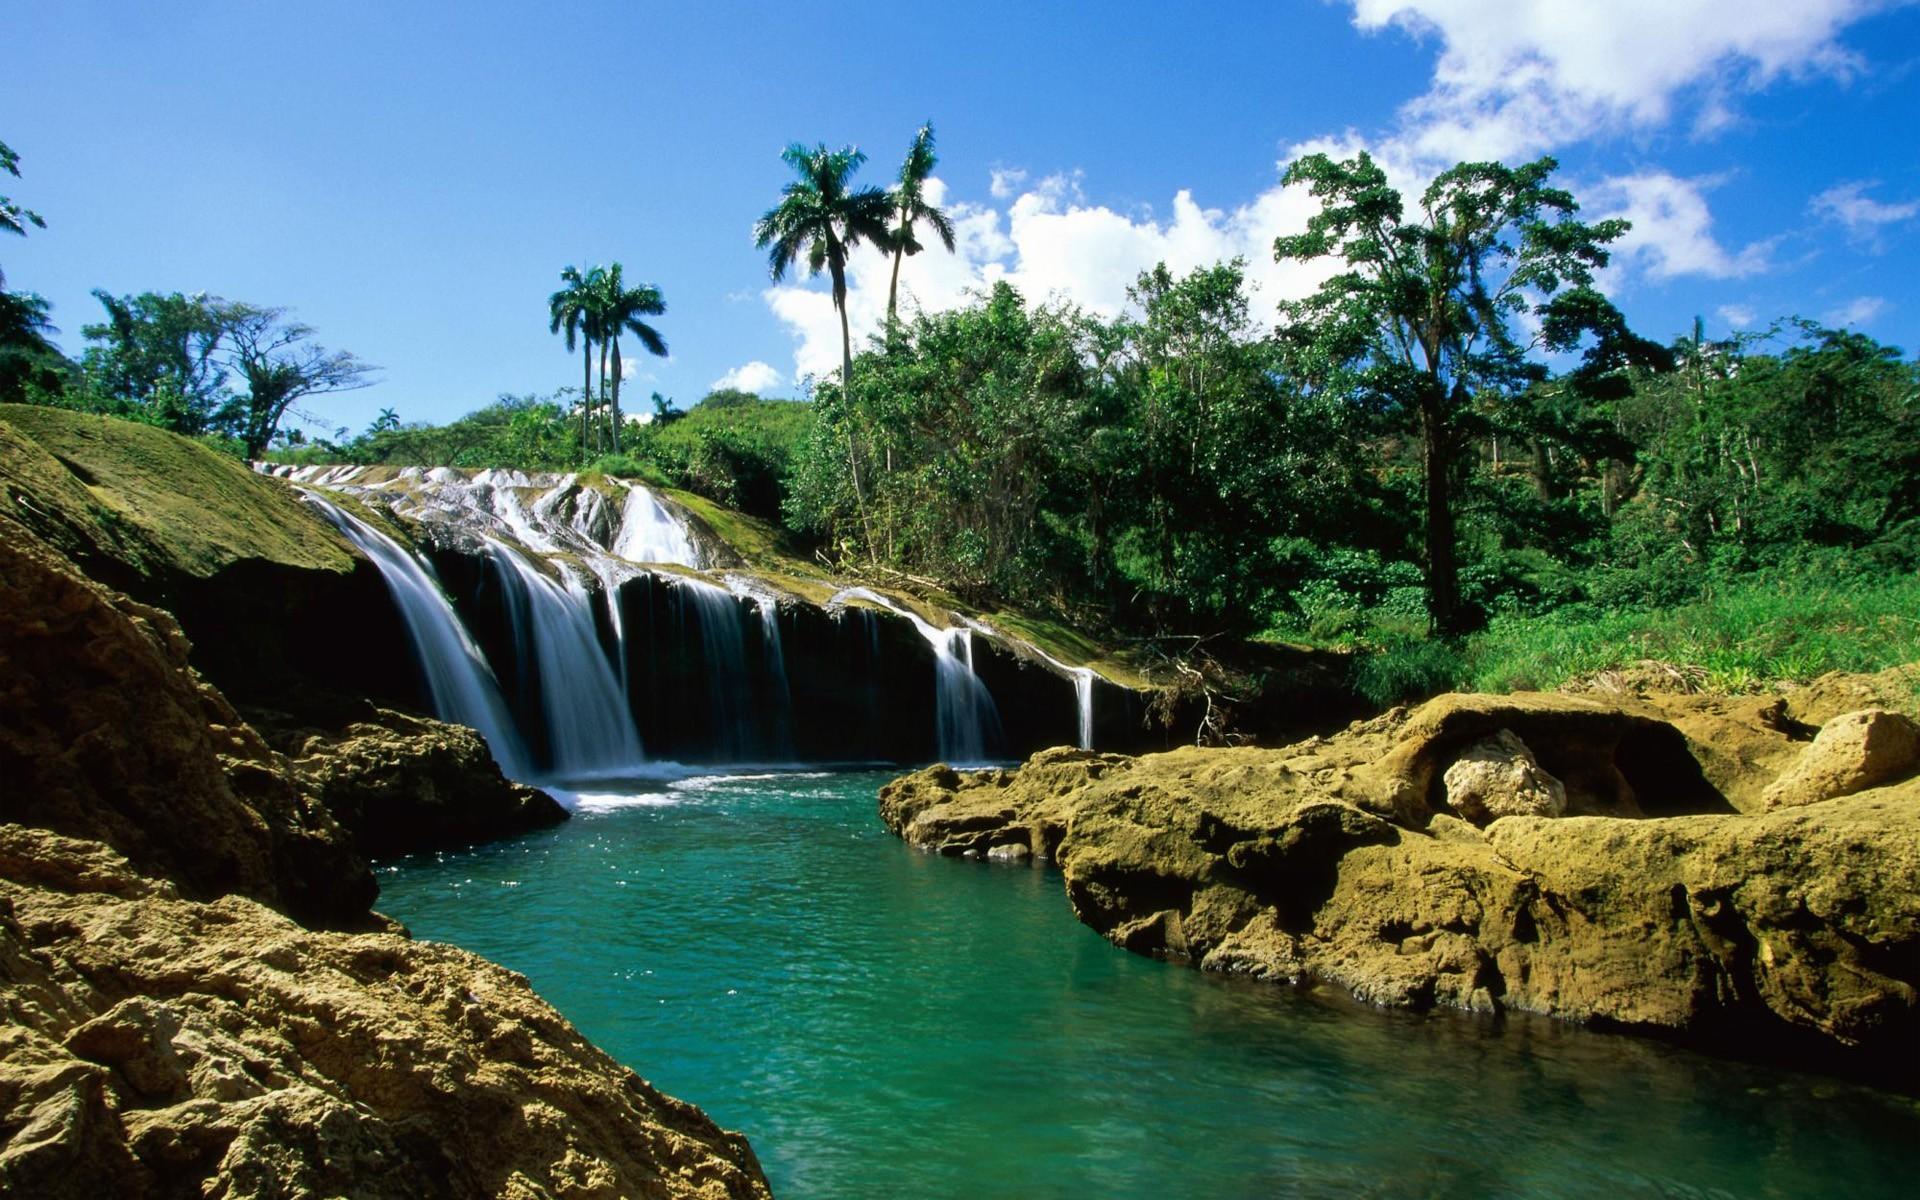 island waterfall image pc